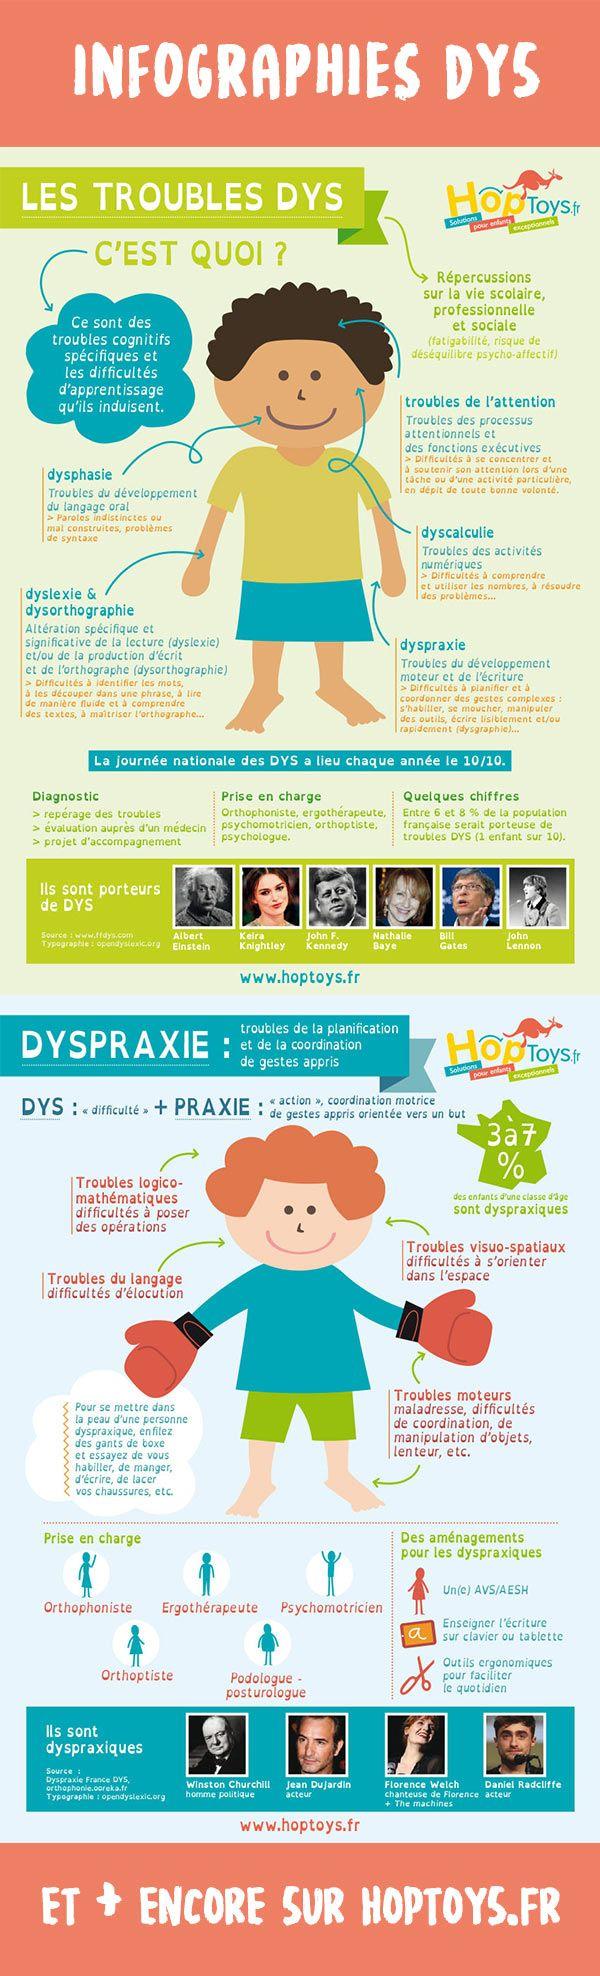 dating dispraxie)